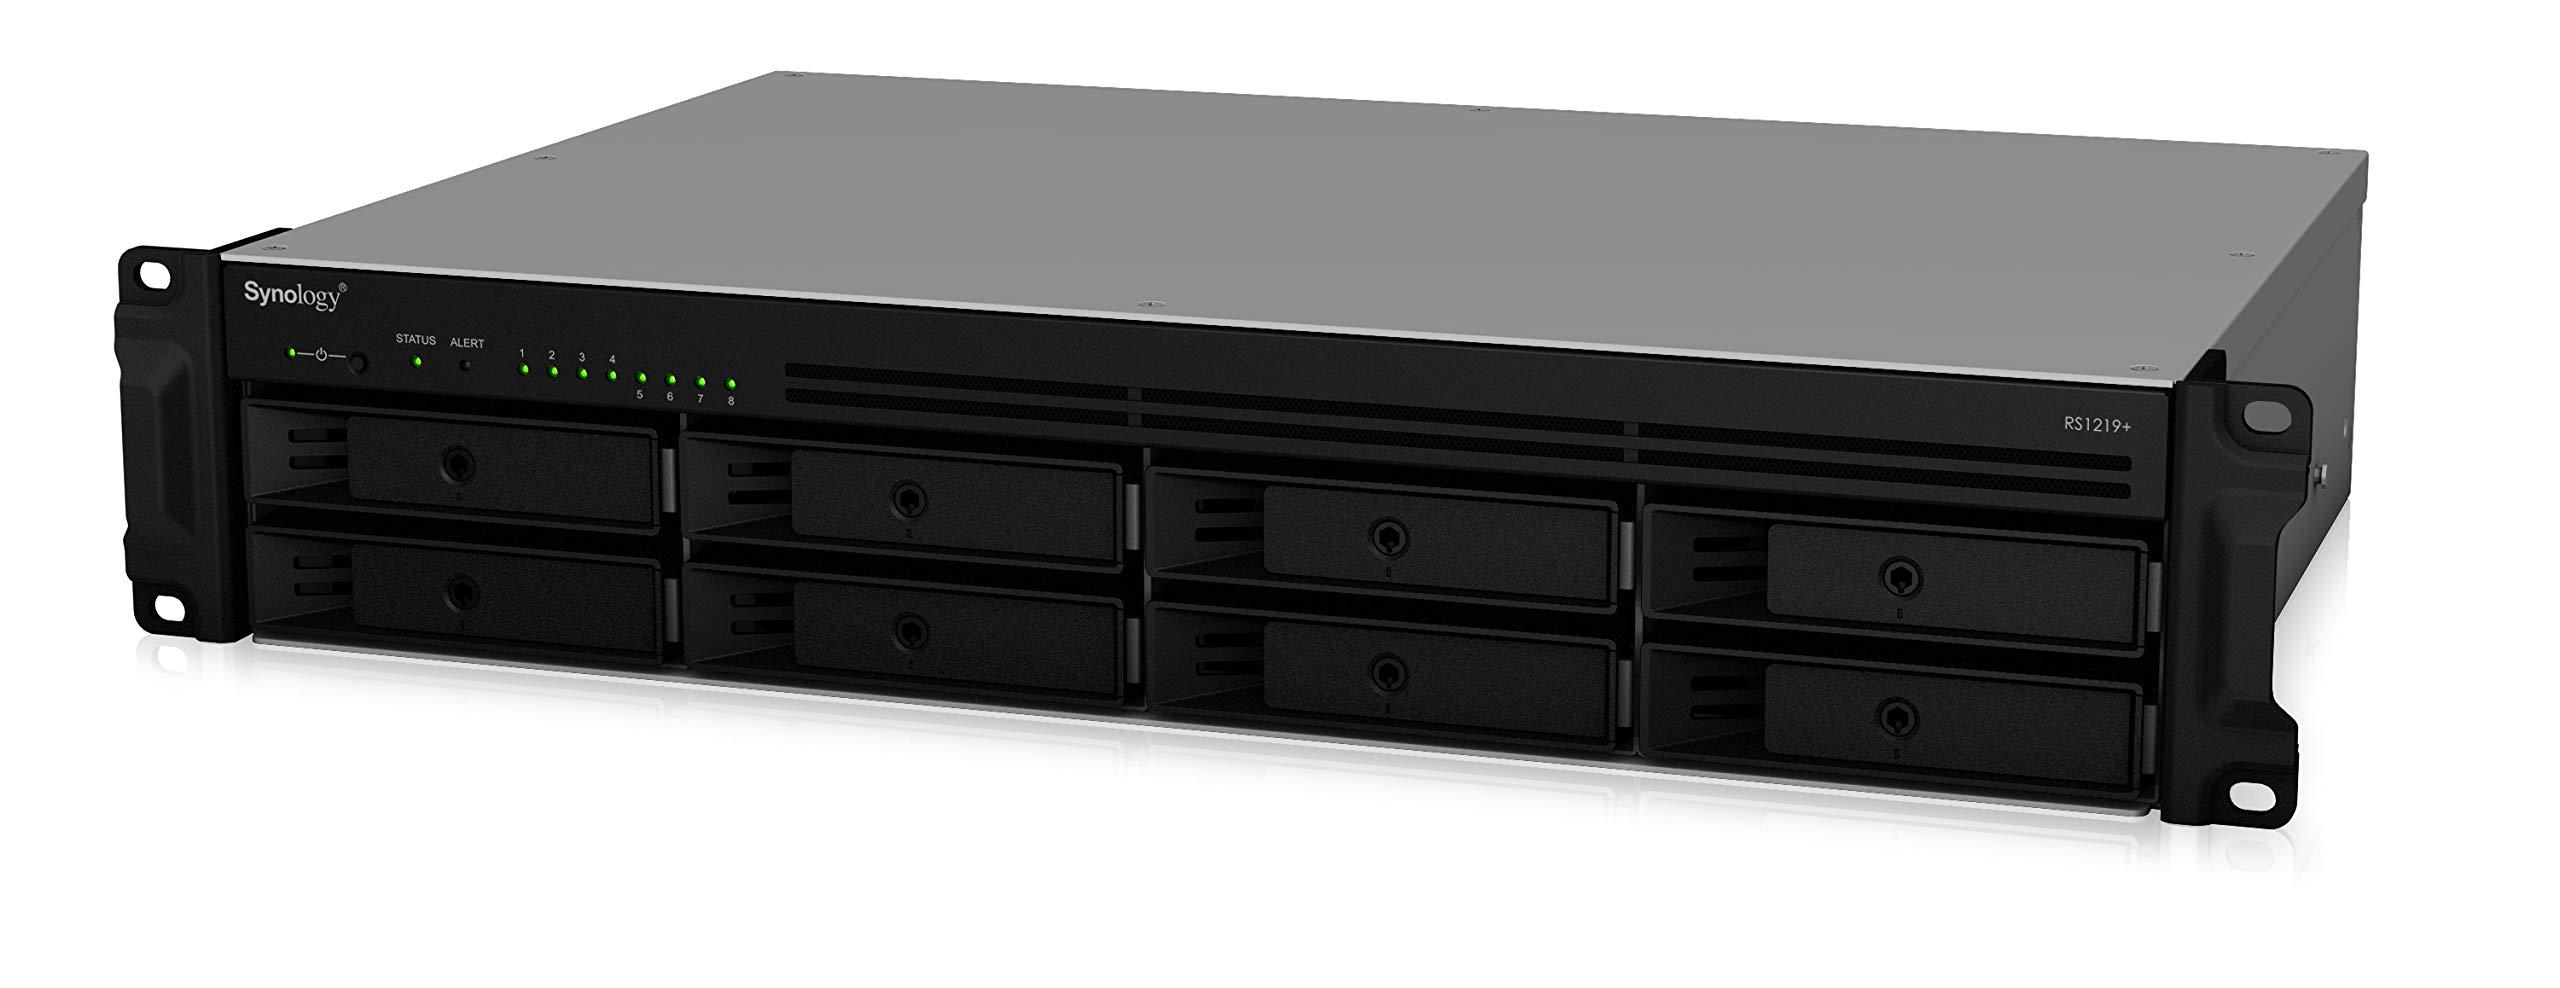 Synology 2U 8-Bay NAS RackStation (Diskless) (RS1219+) by Synology